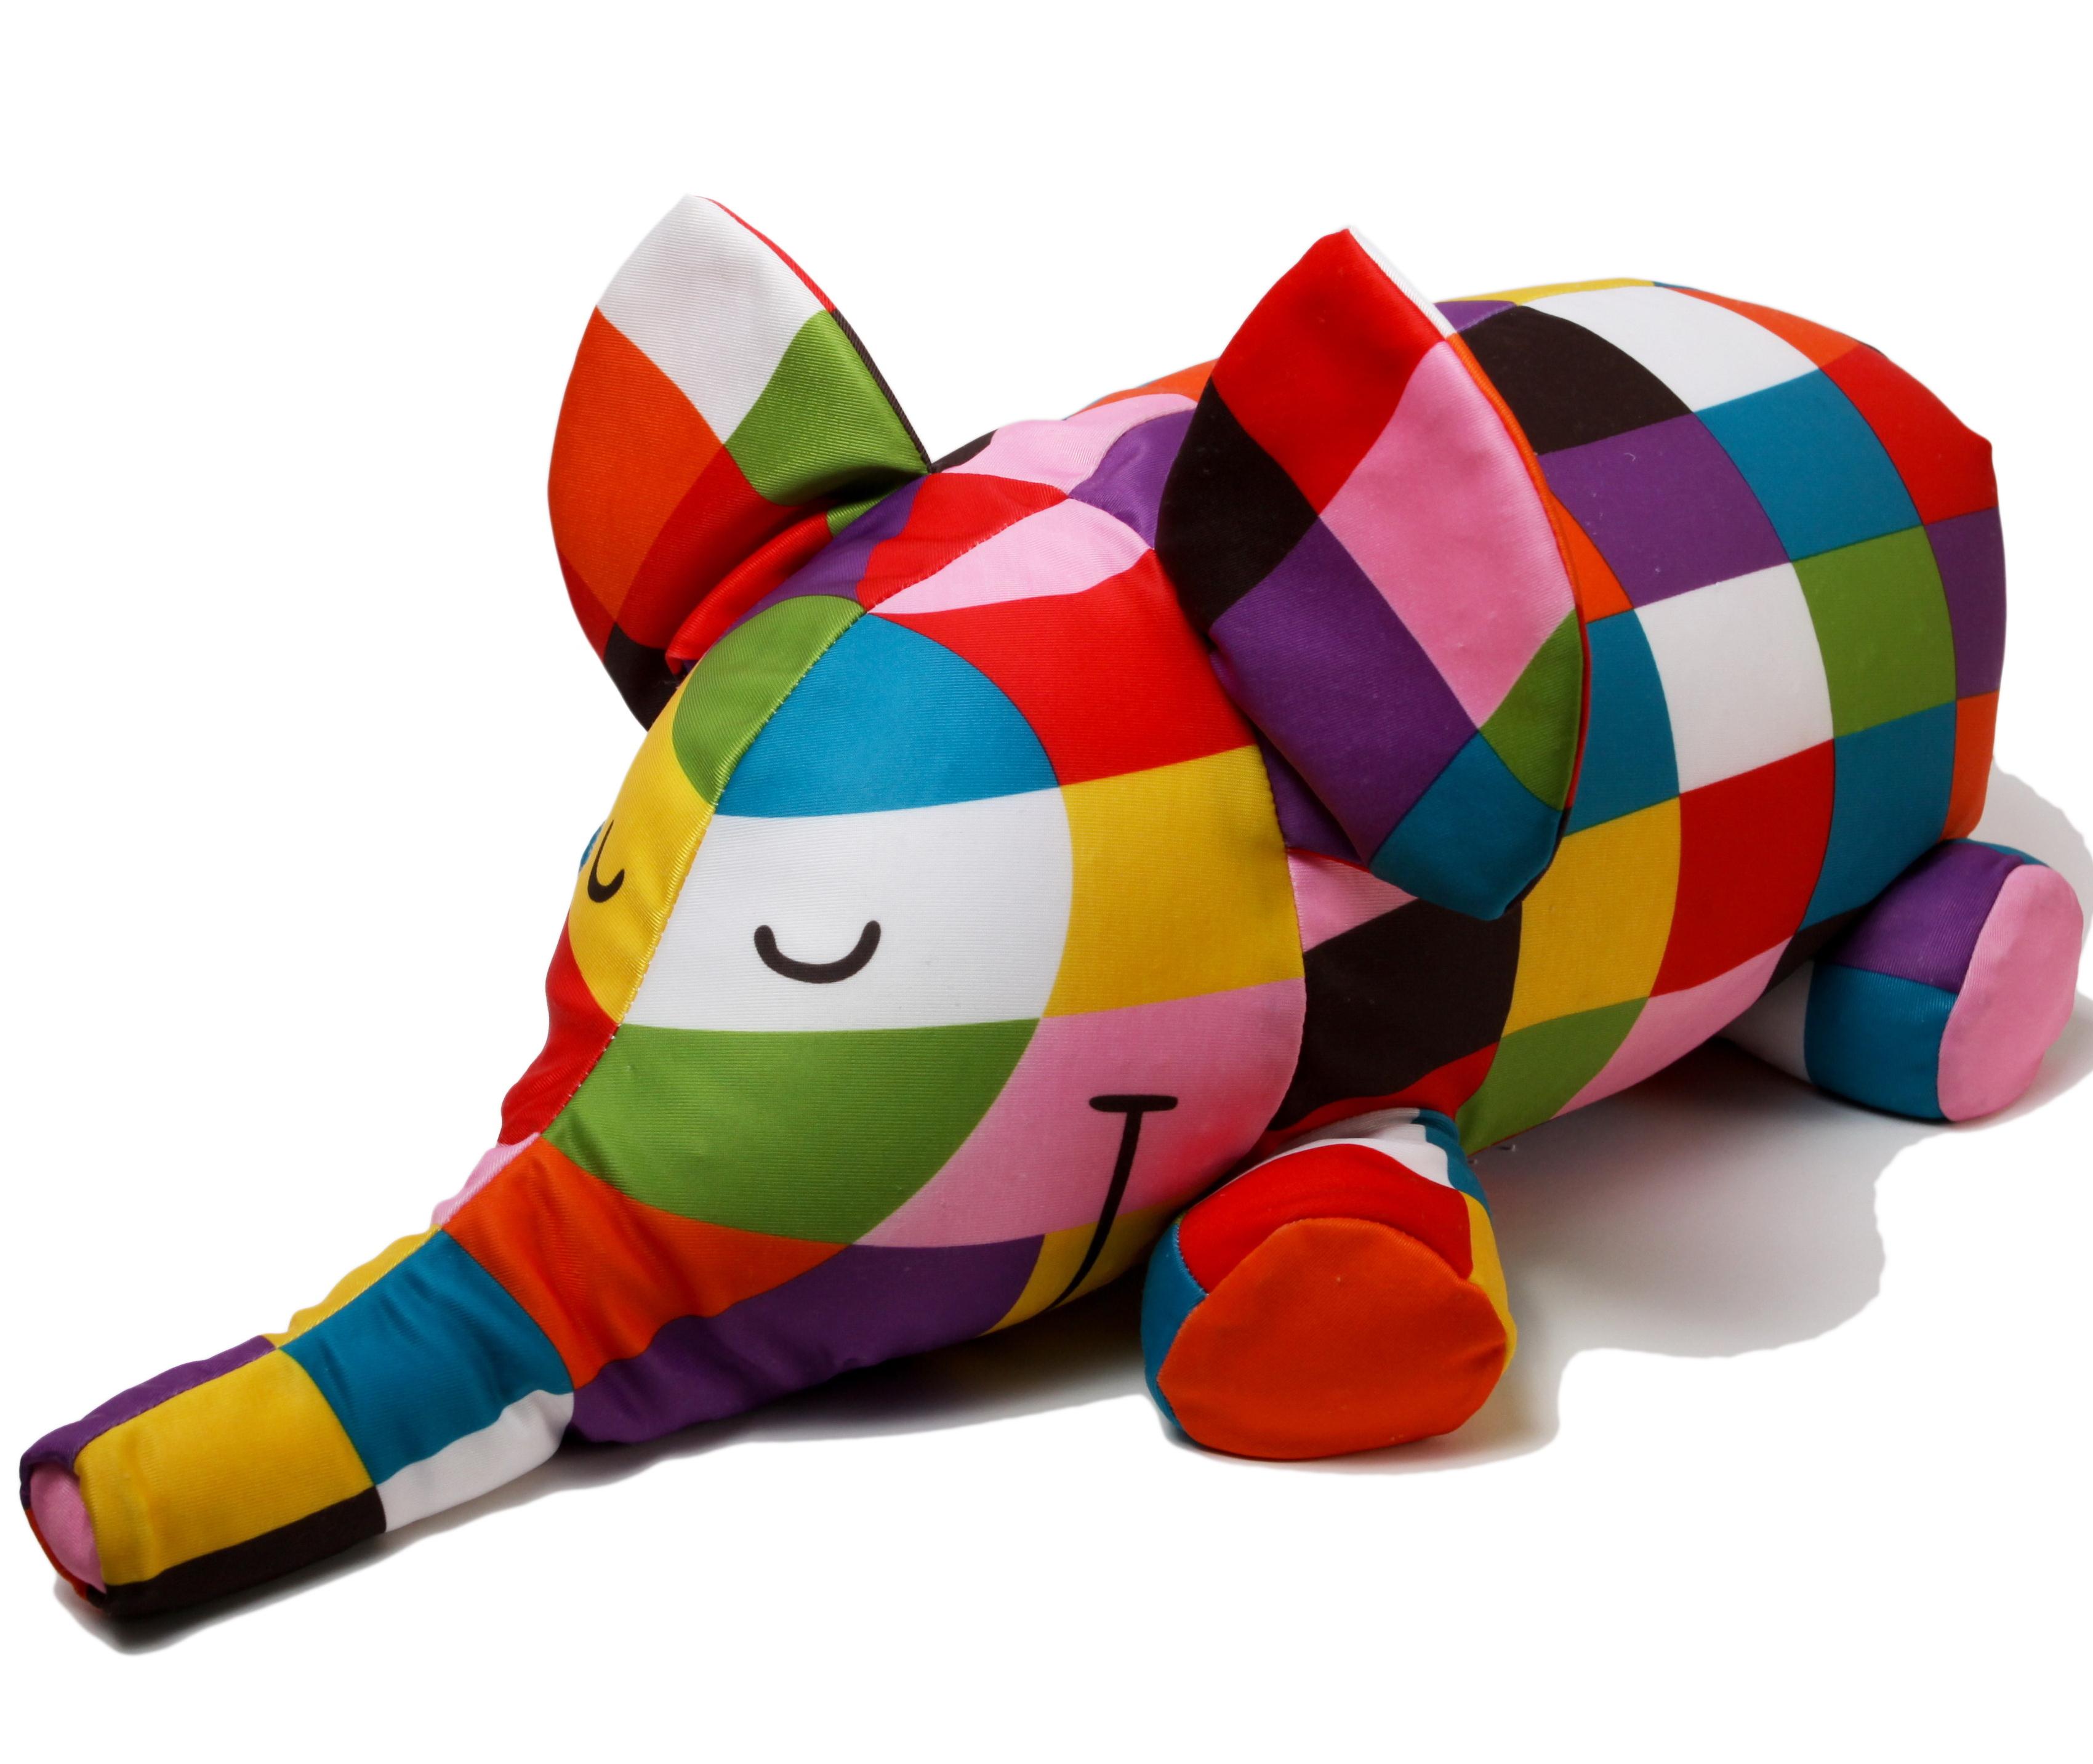 Мягкие игрушки антистресс своими руками